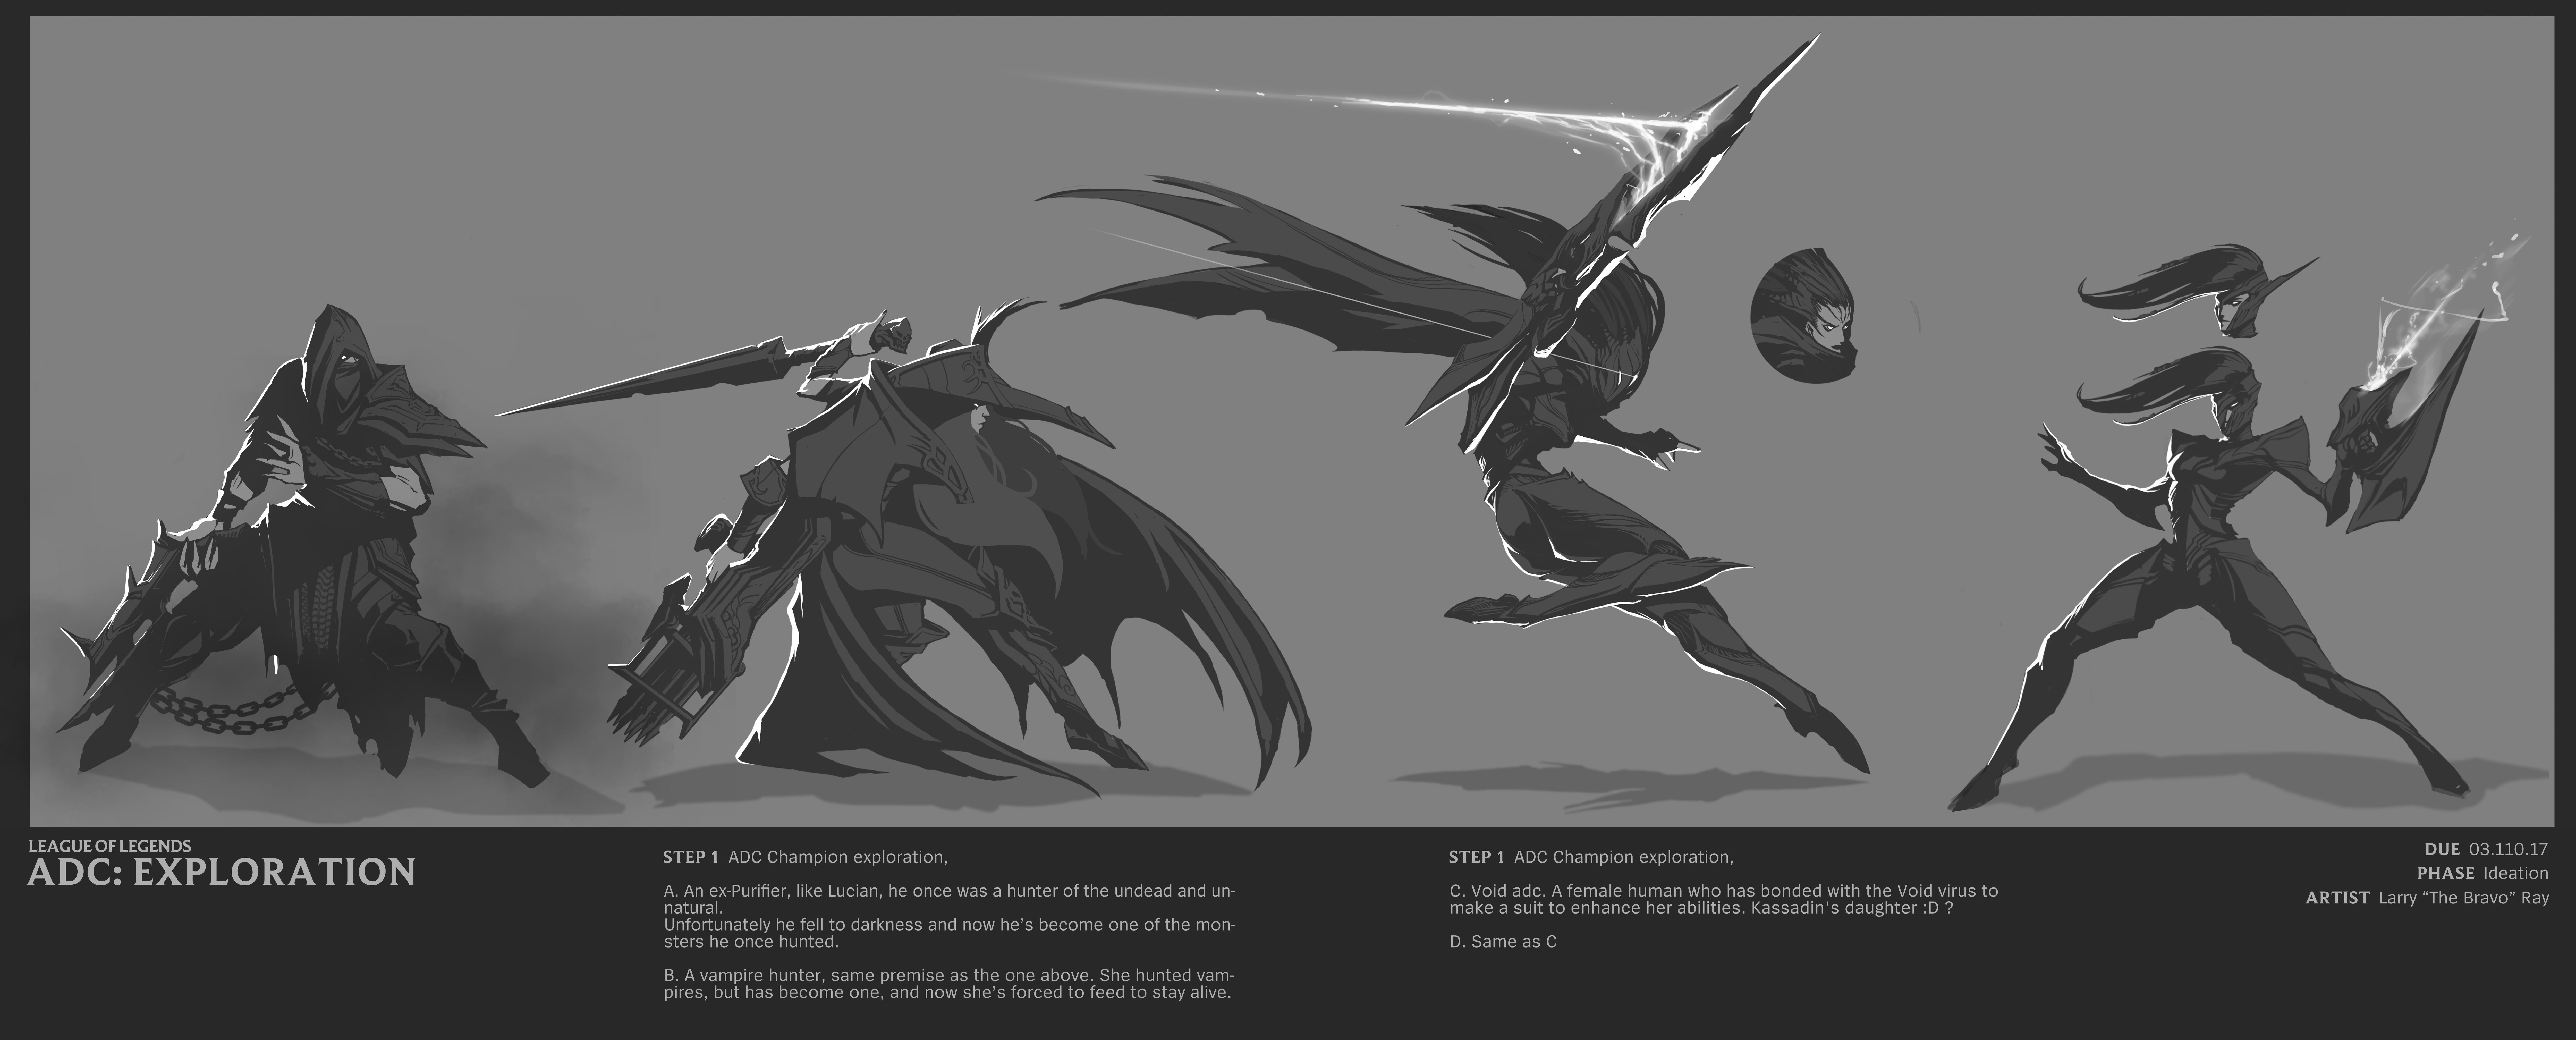 Filekaisa Concept 2jpg Leaguepedia League Of Legends